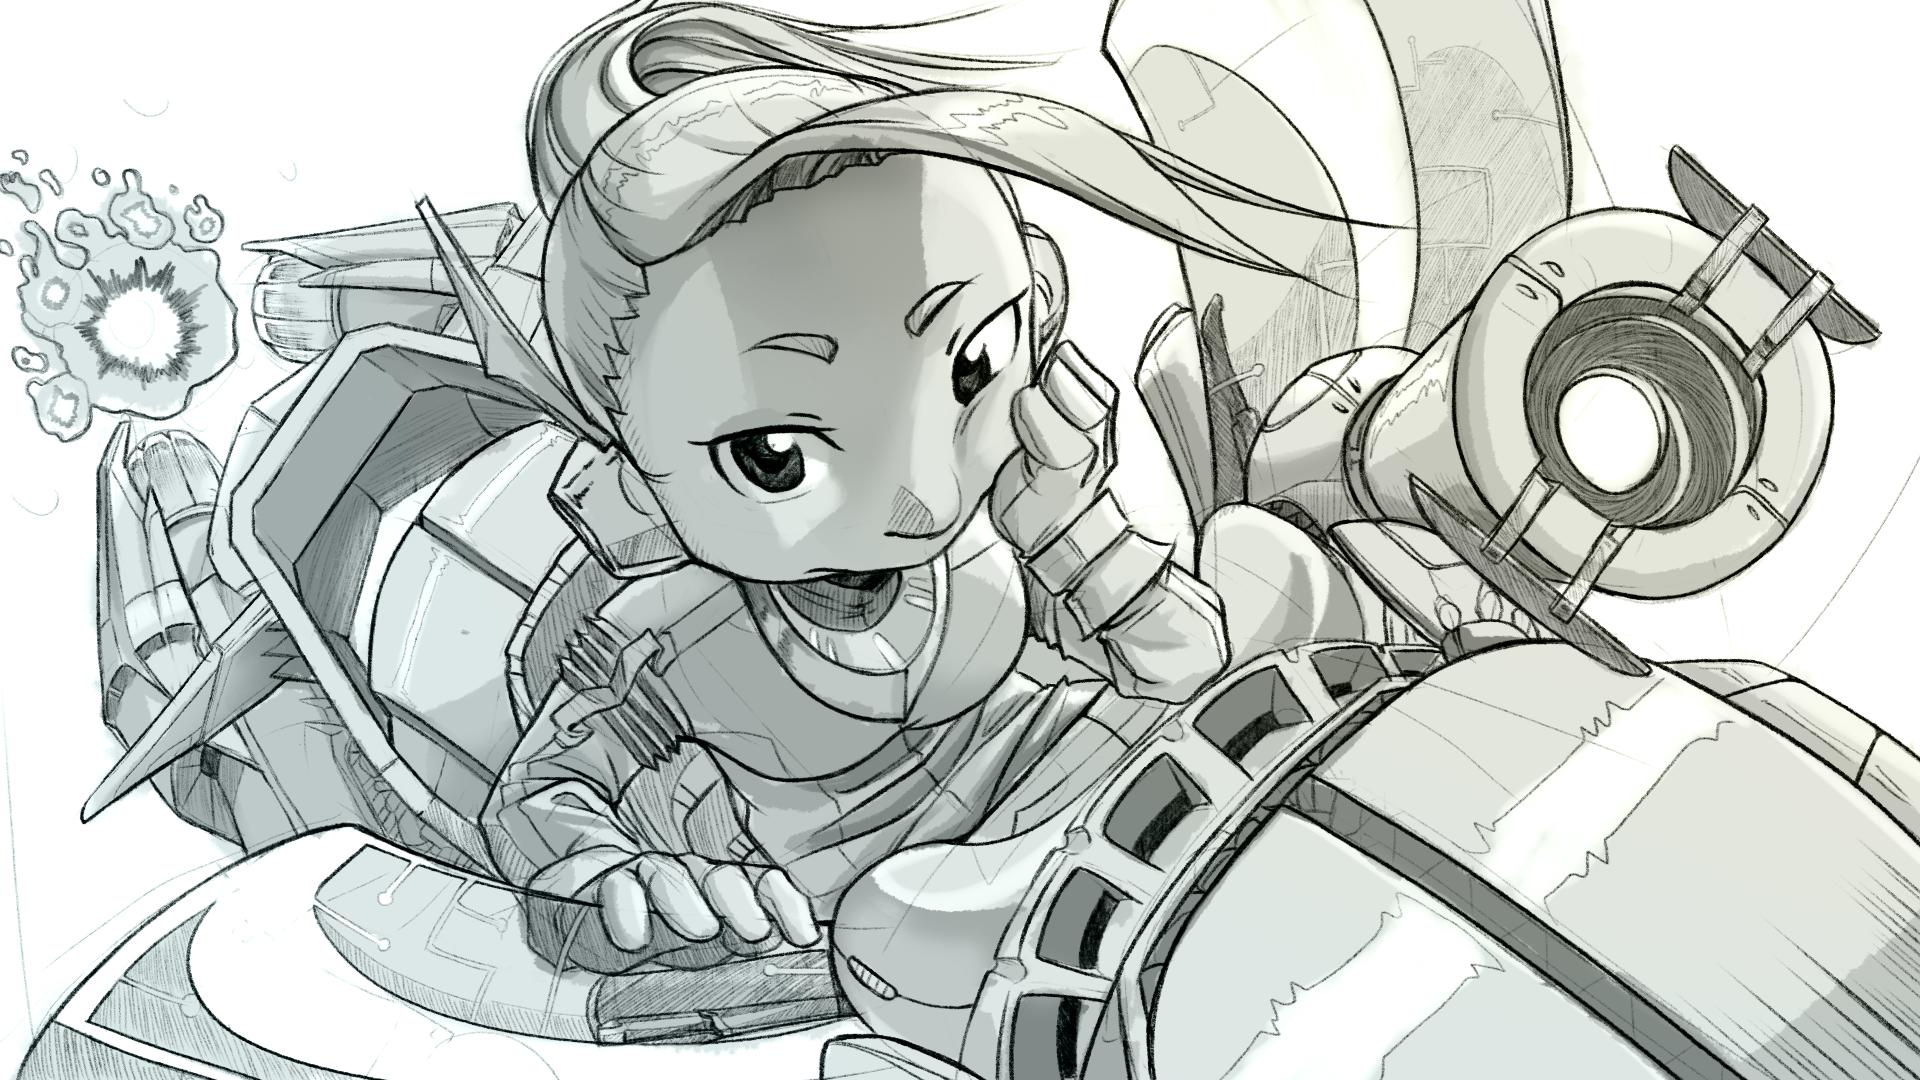 Sci-fi Motorgirl